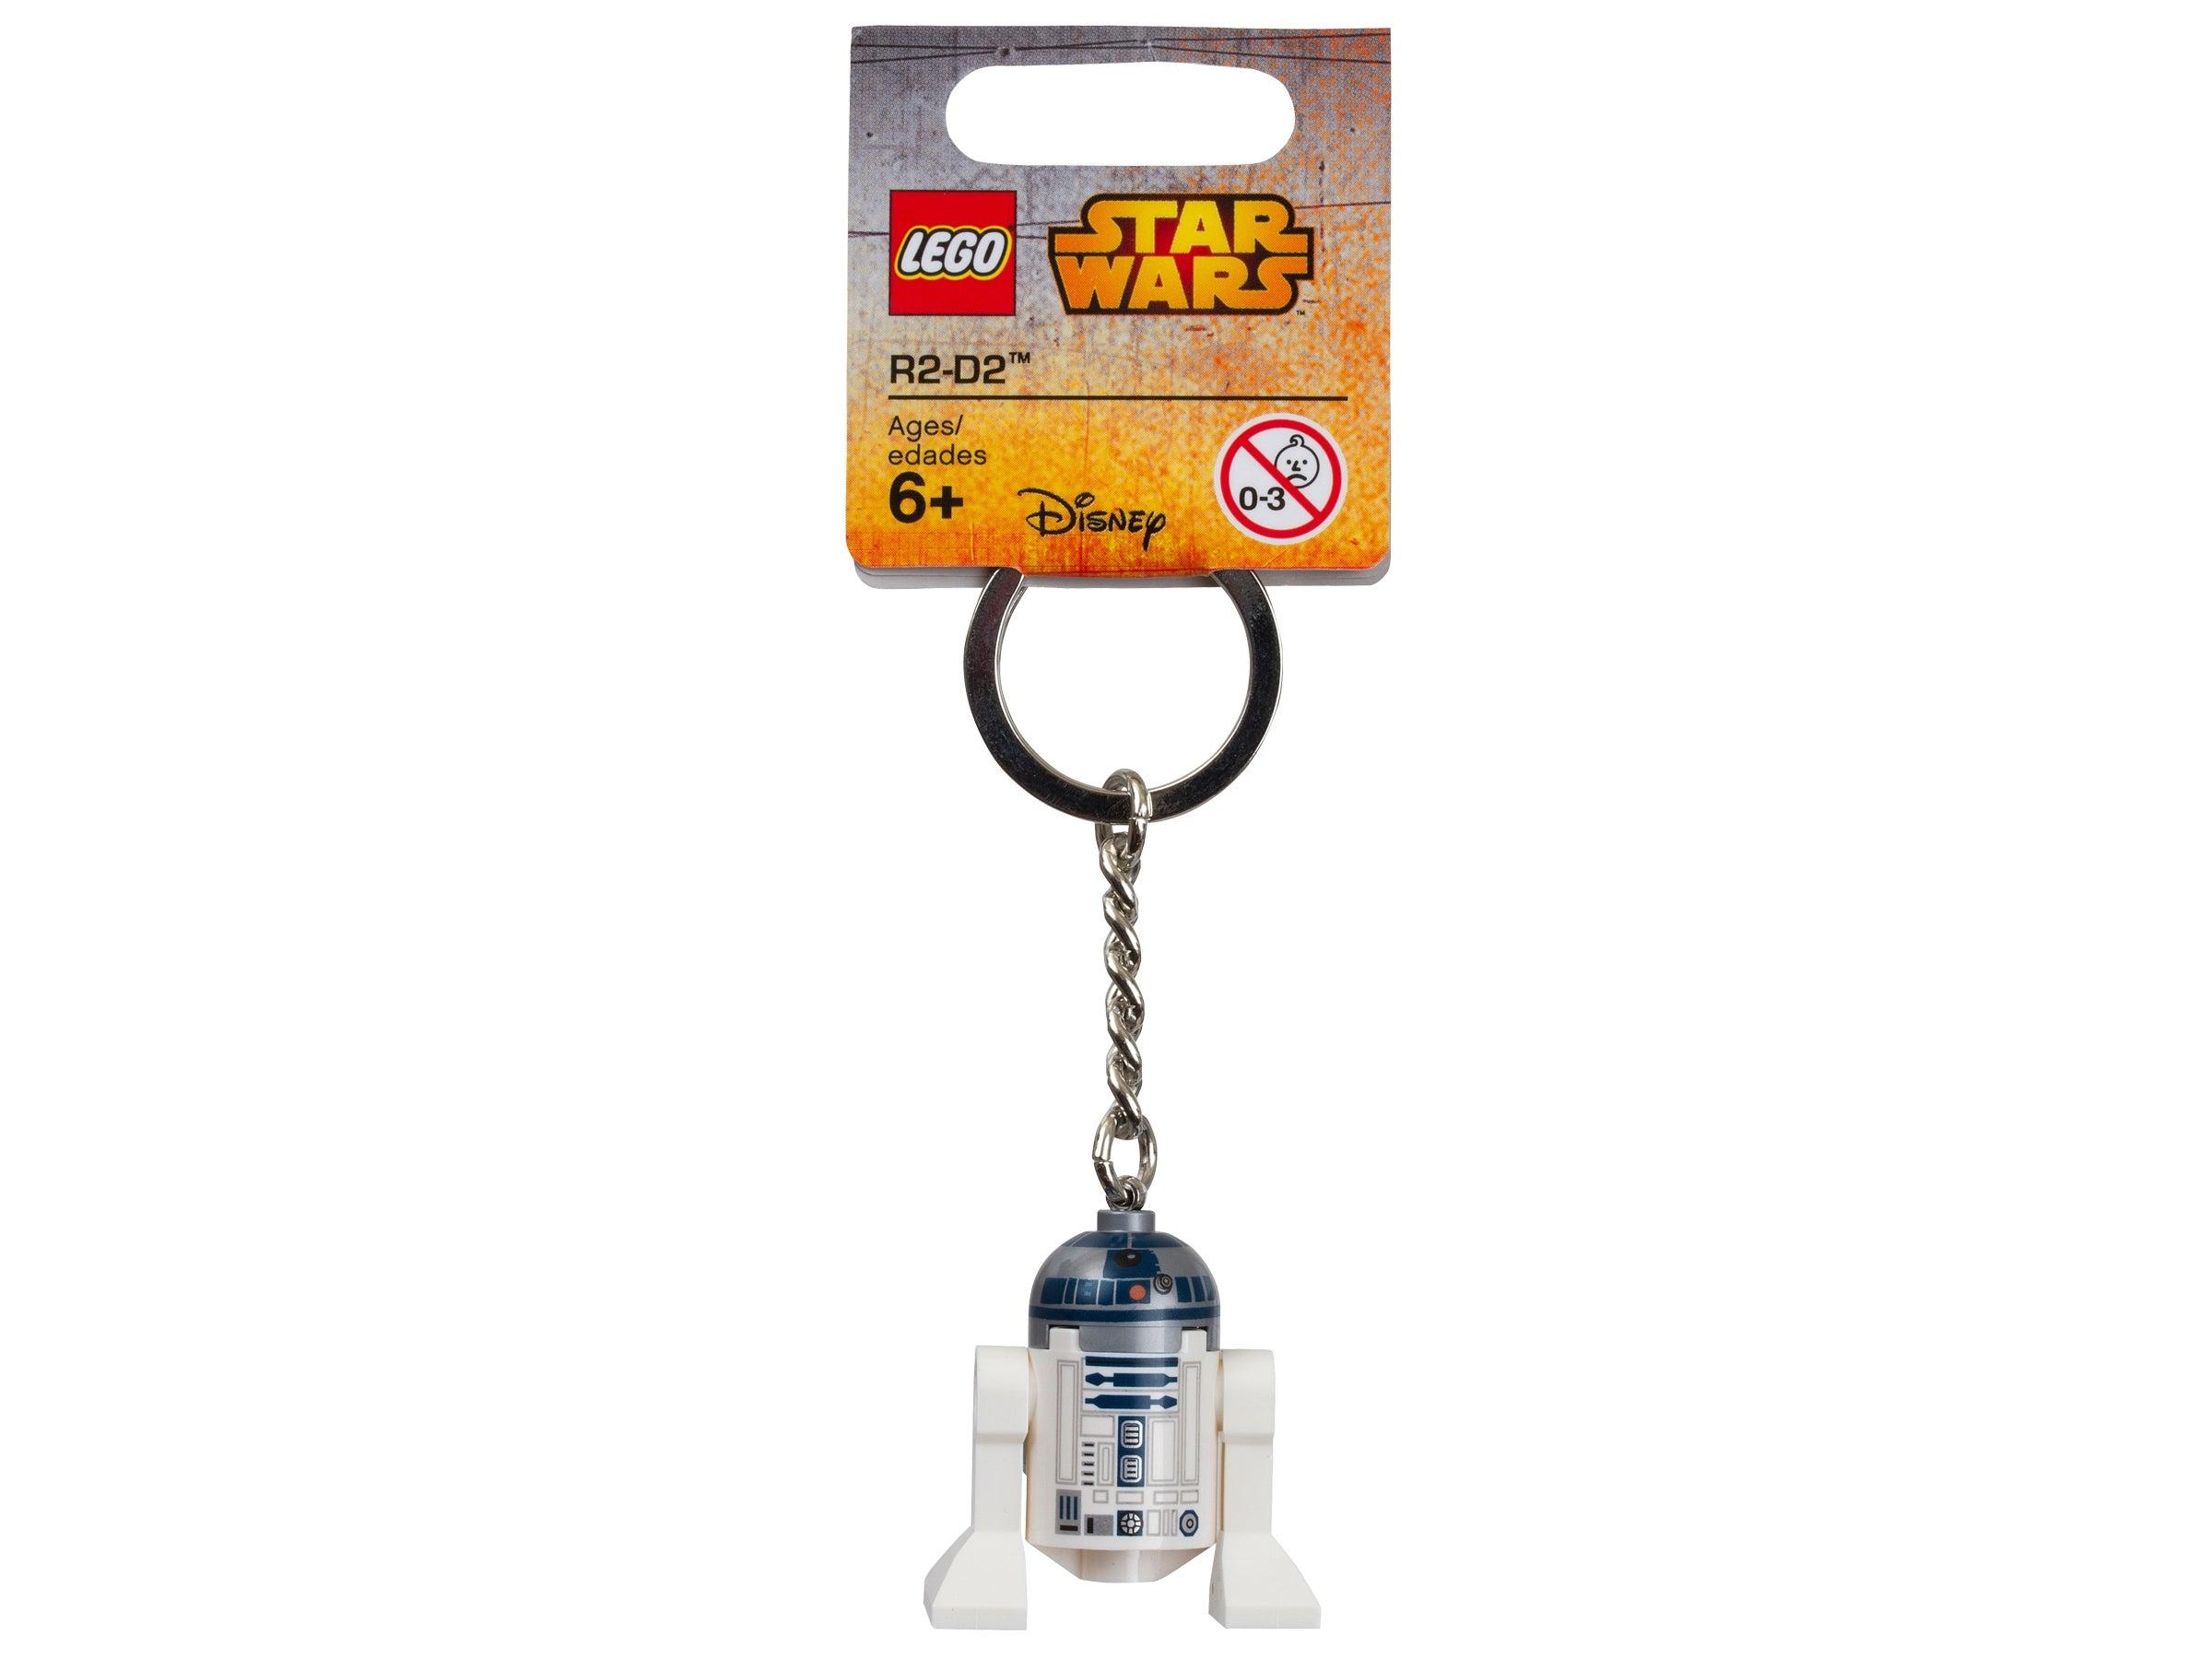 Lego Star Wars R2-D2 Key Ring// Key Chain BRAND NEW